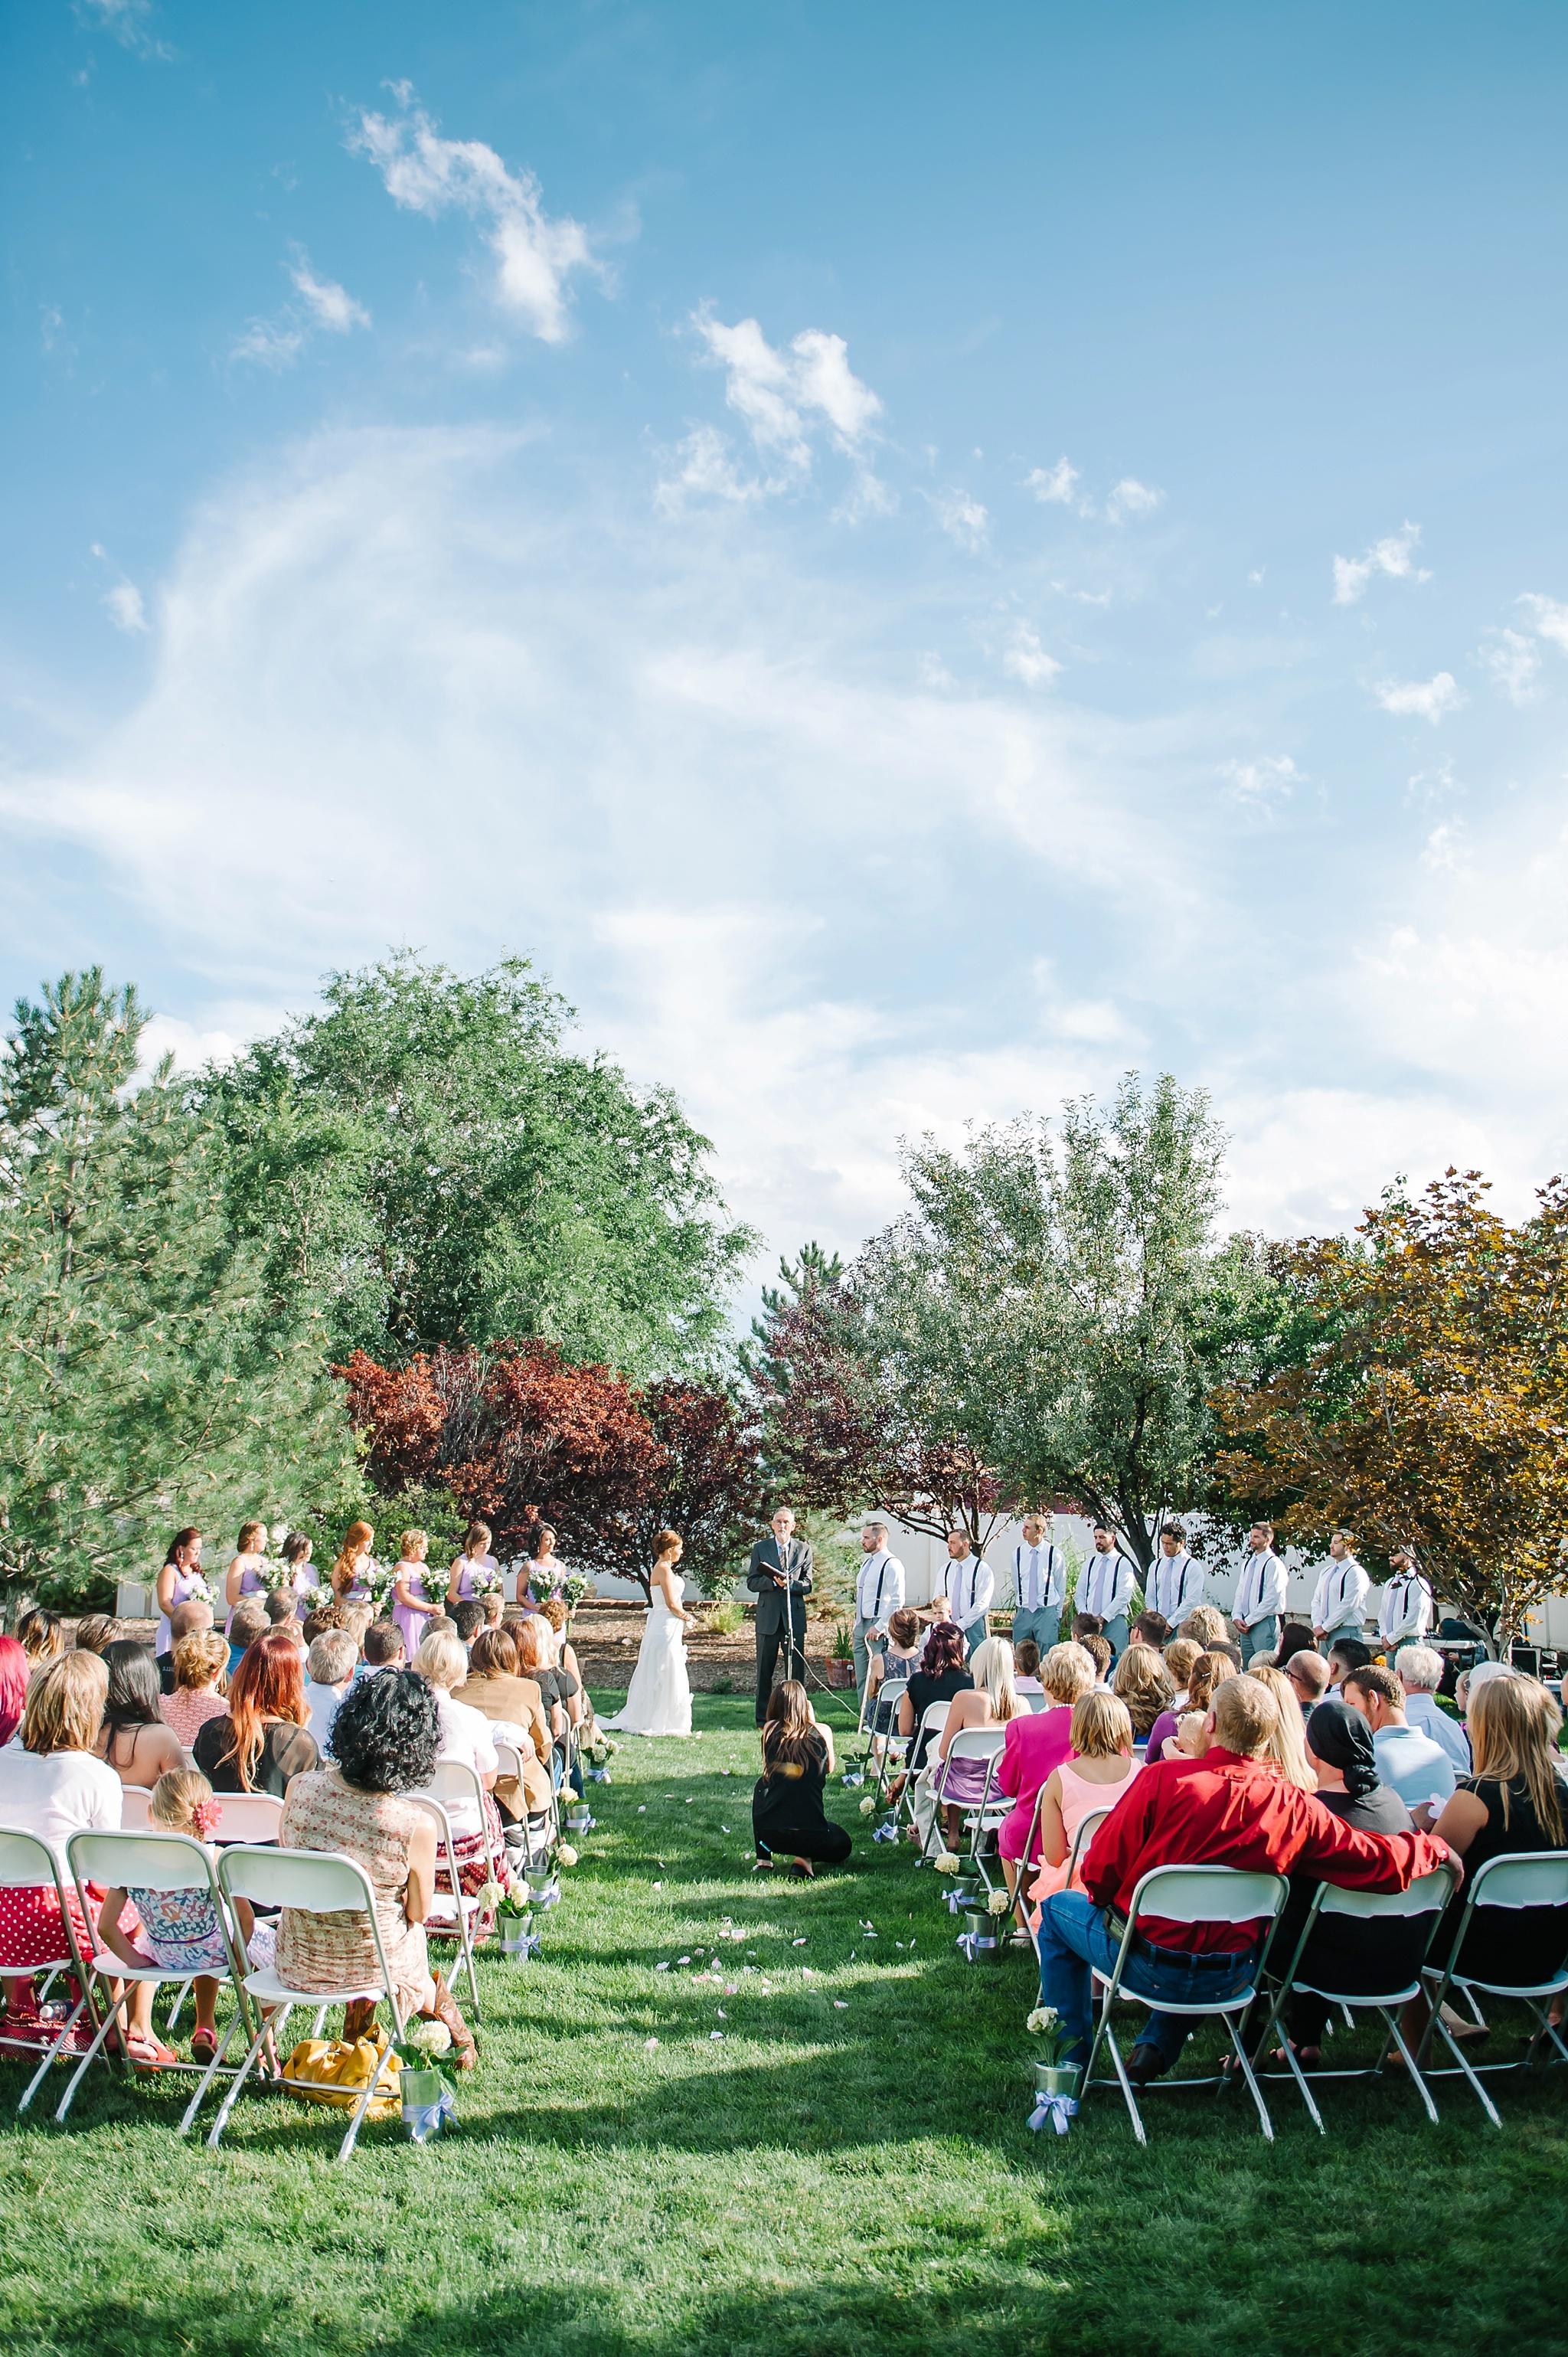 Utah Salt Lake Family Photographer Ali Sumsion 089